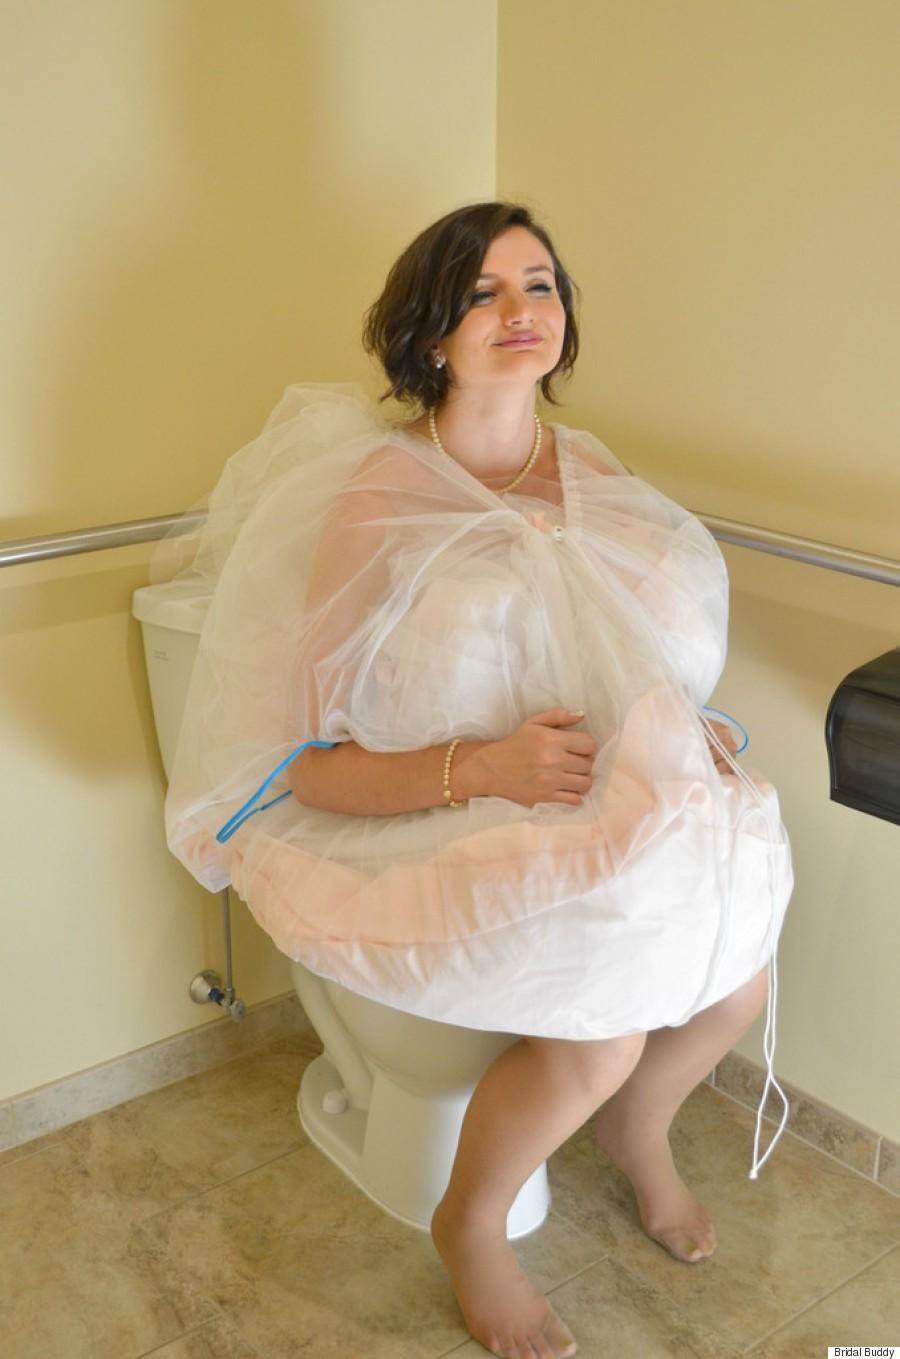 141cf9499d5 Bridal Buddy - The Beautiful Bride Shop